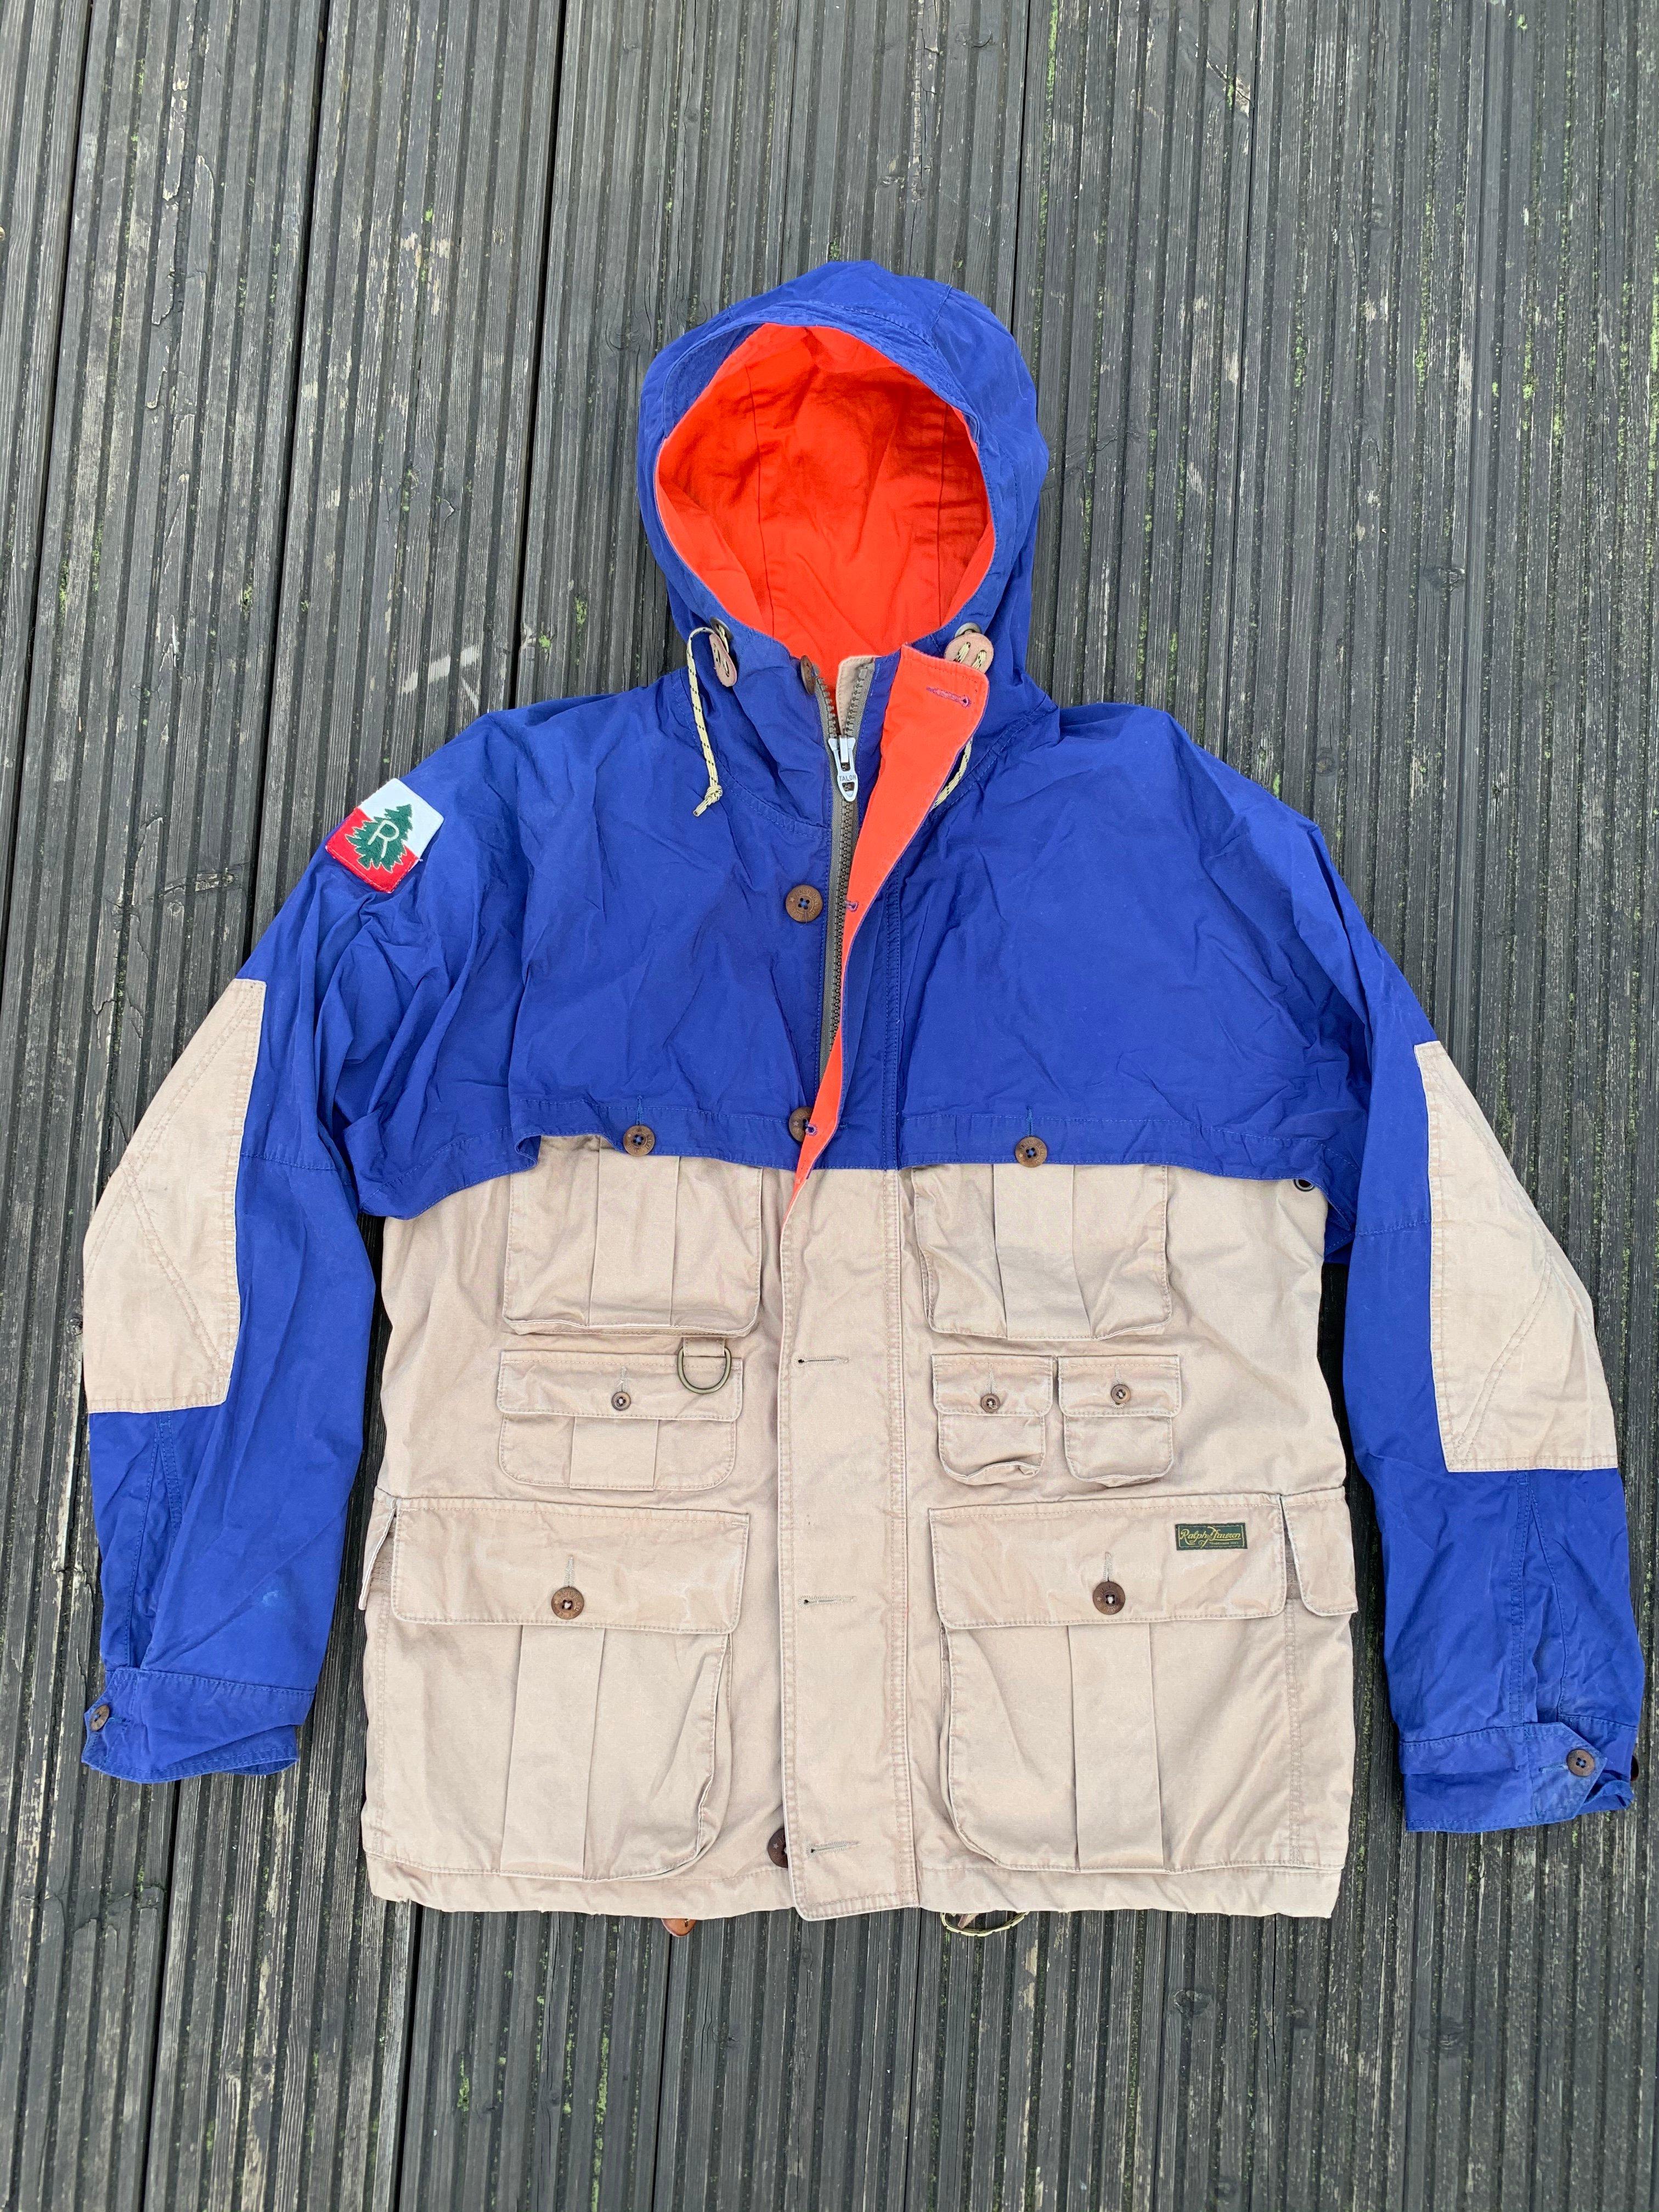 Image of Old Ralph Lauren hunting jacket